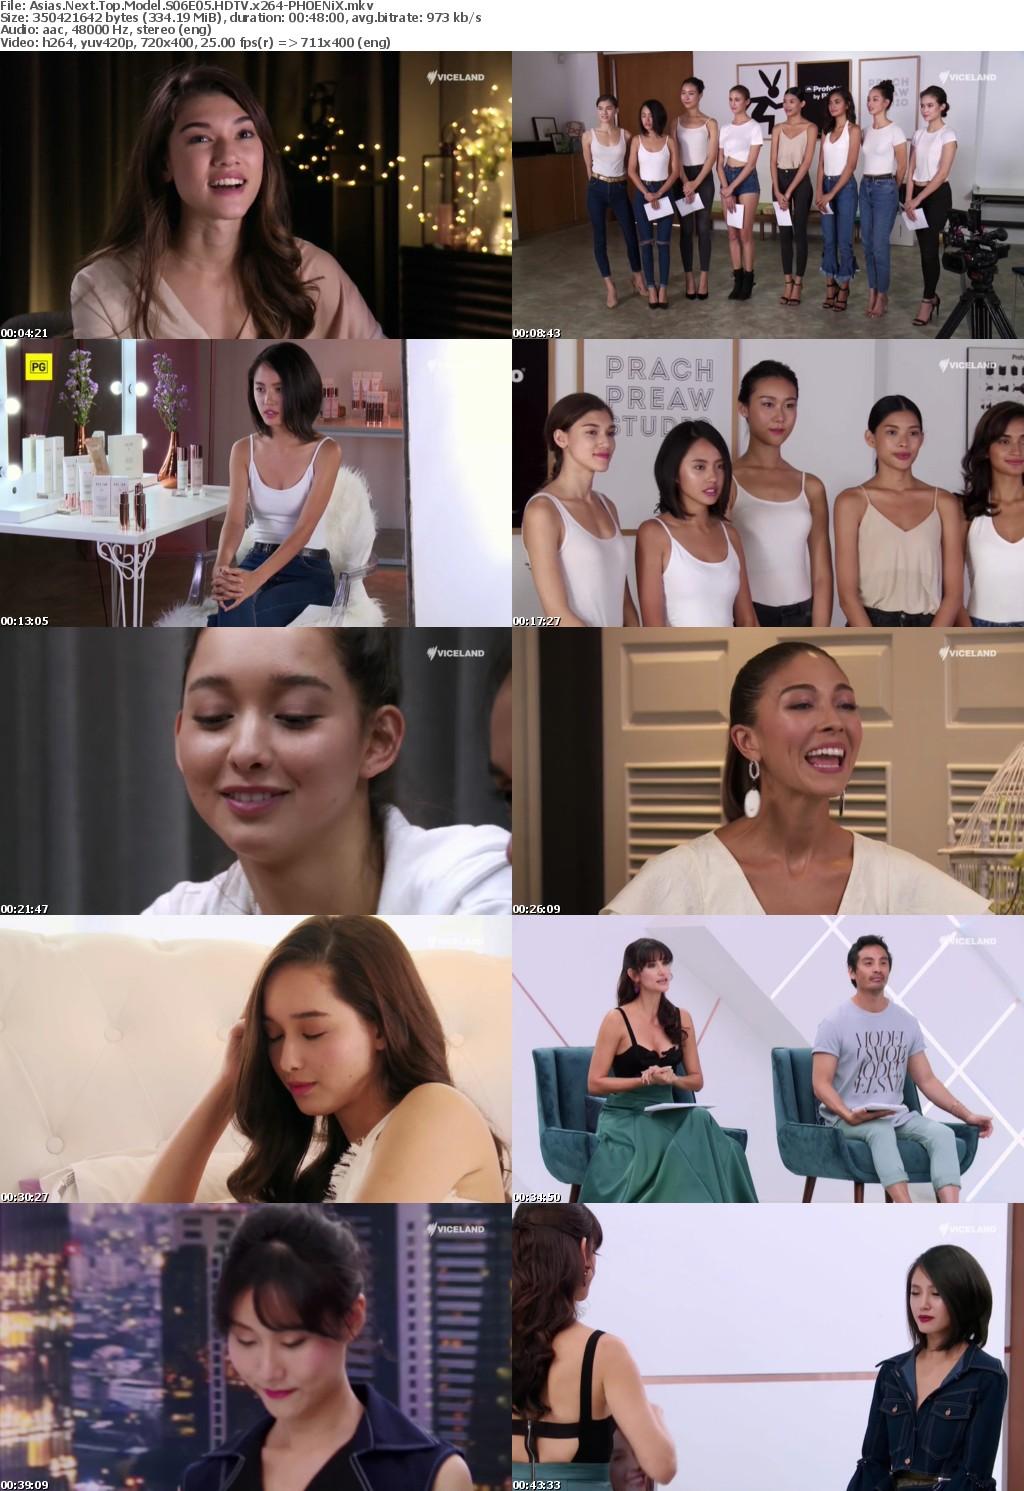 Asias Next Top Model S06E05 HDTV x264-PHOENiX